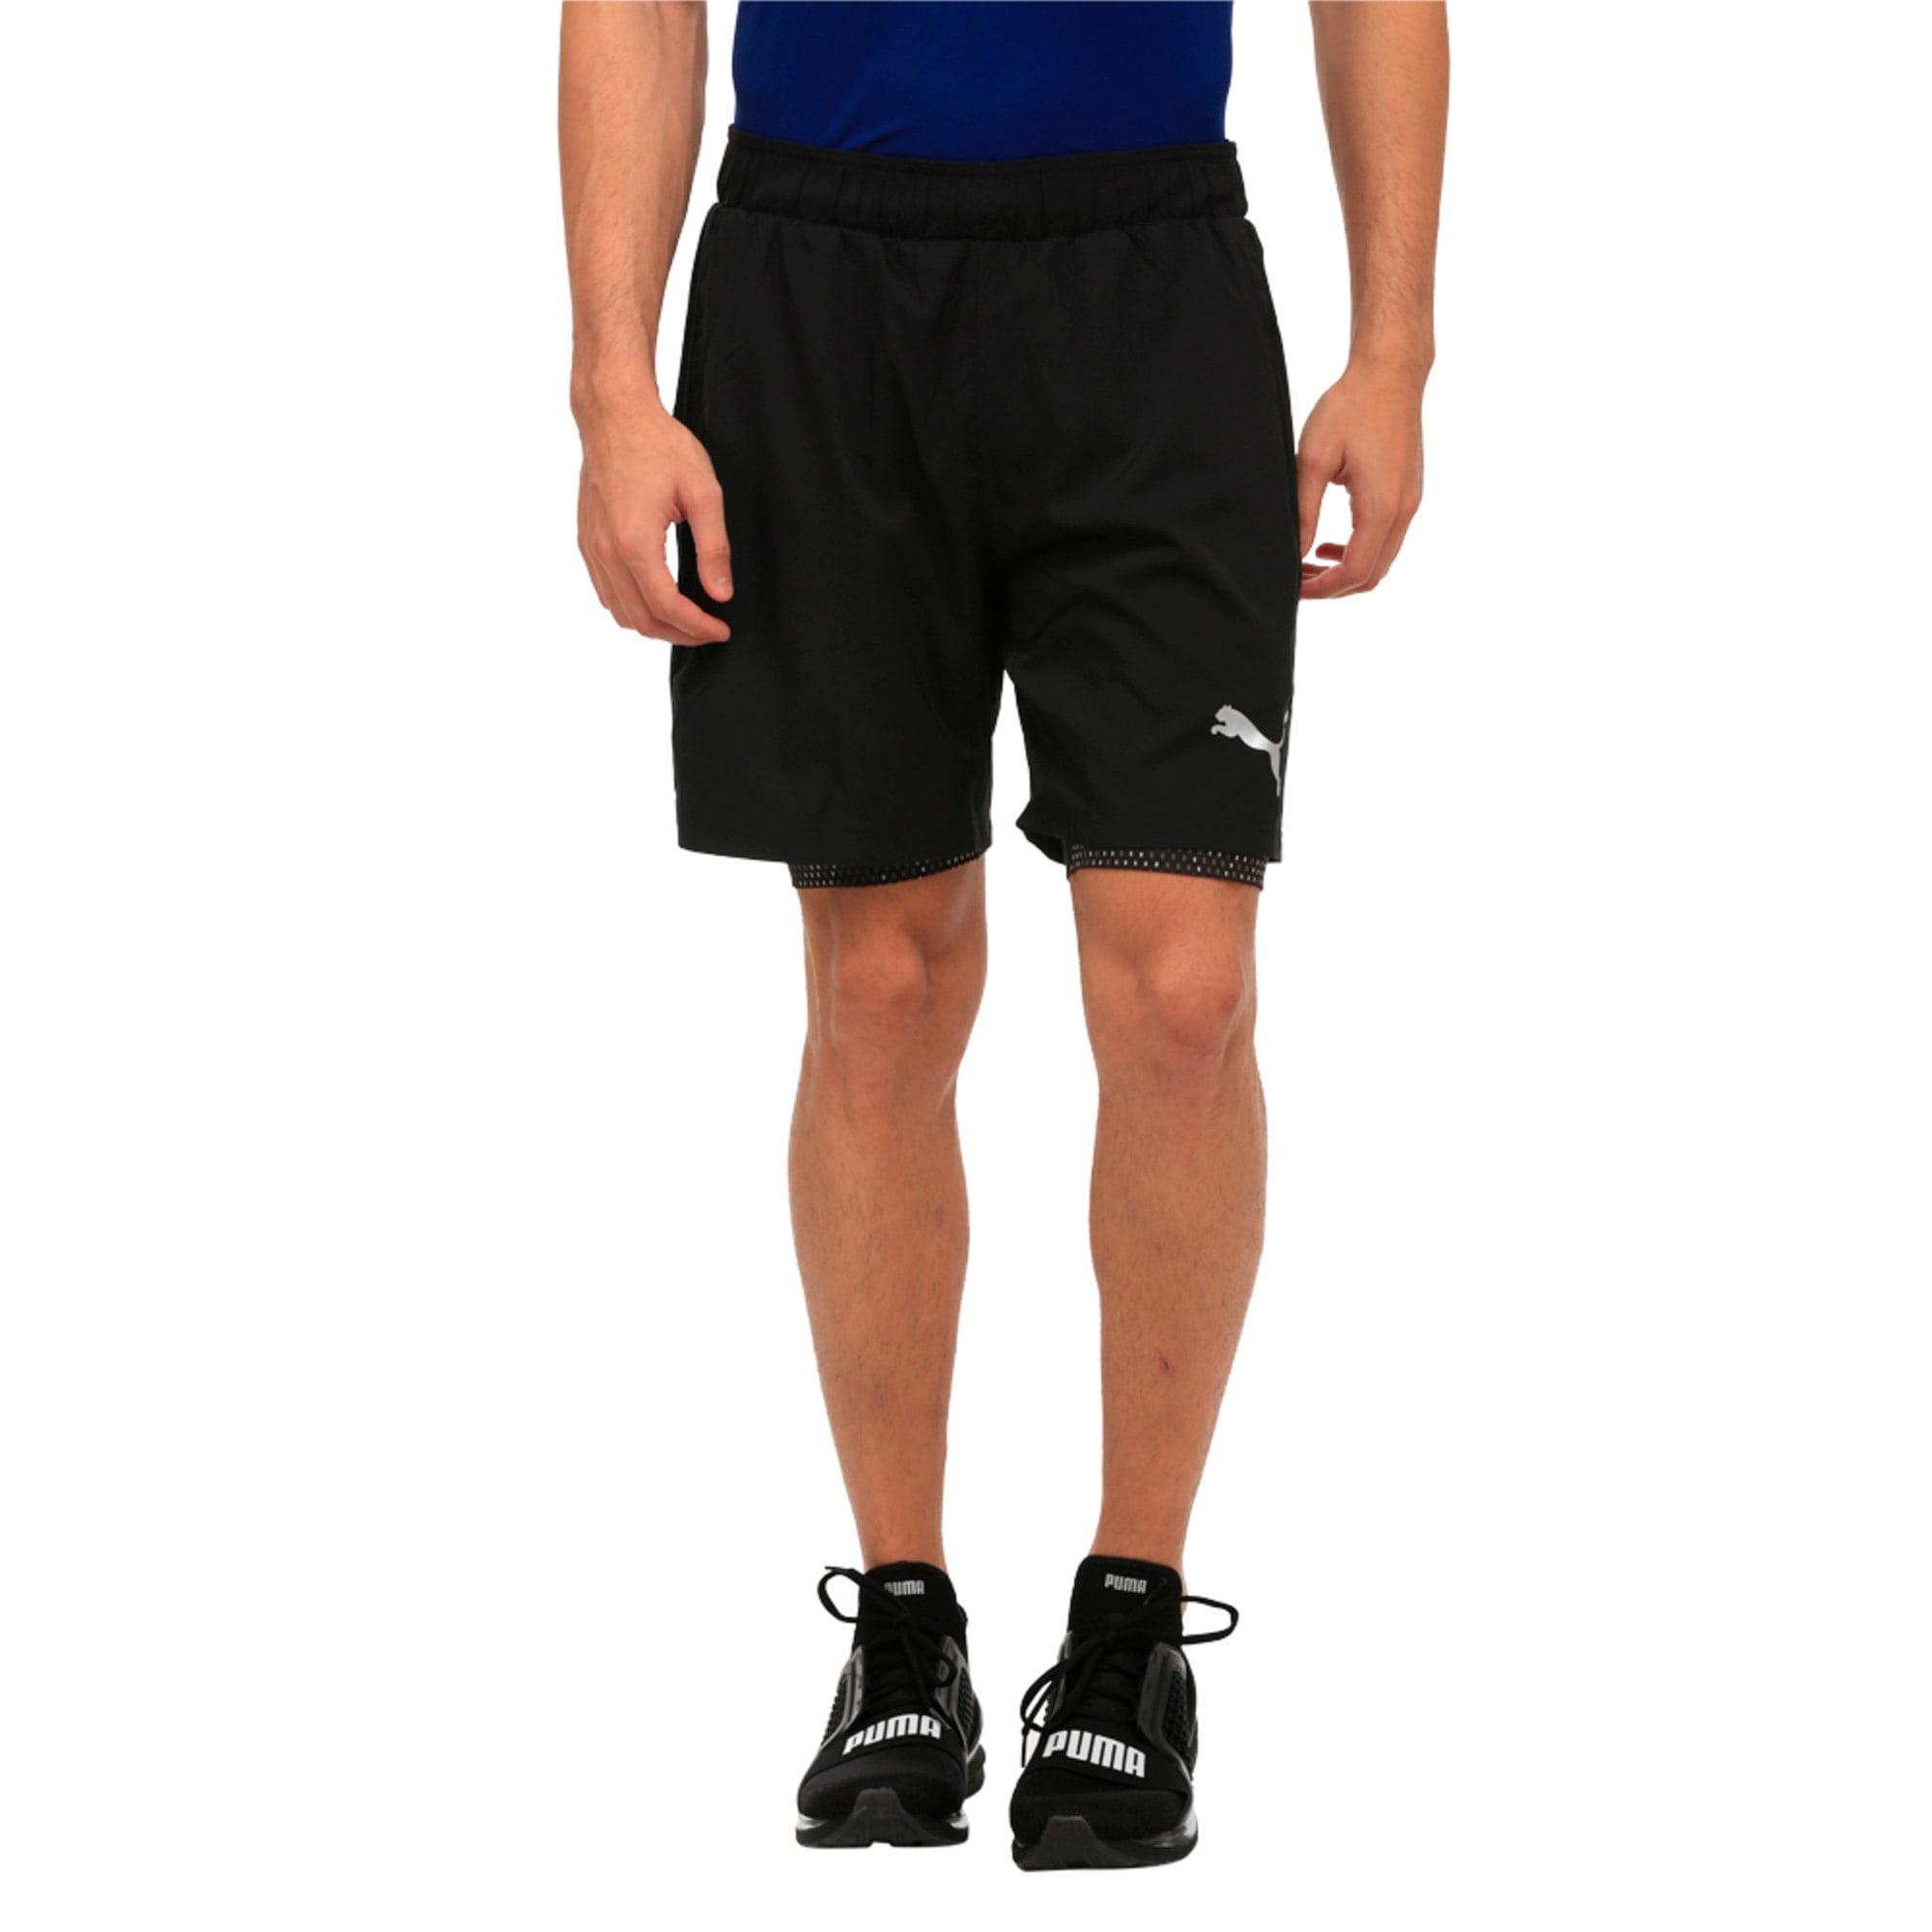 Thumbnail 1 of Active Training Men's 2 in 1 Shorts, Puma Black, medium-IND